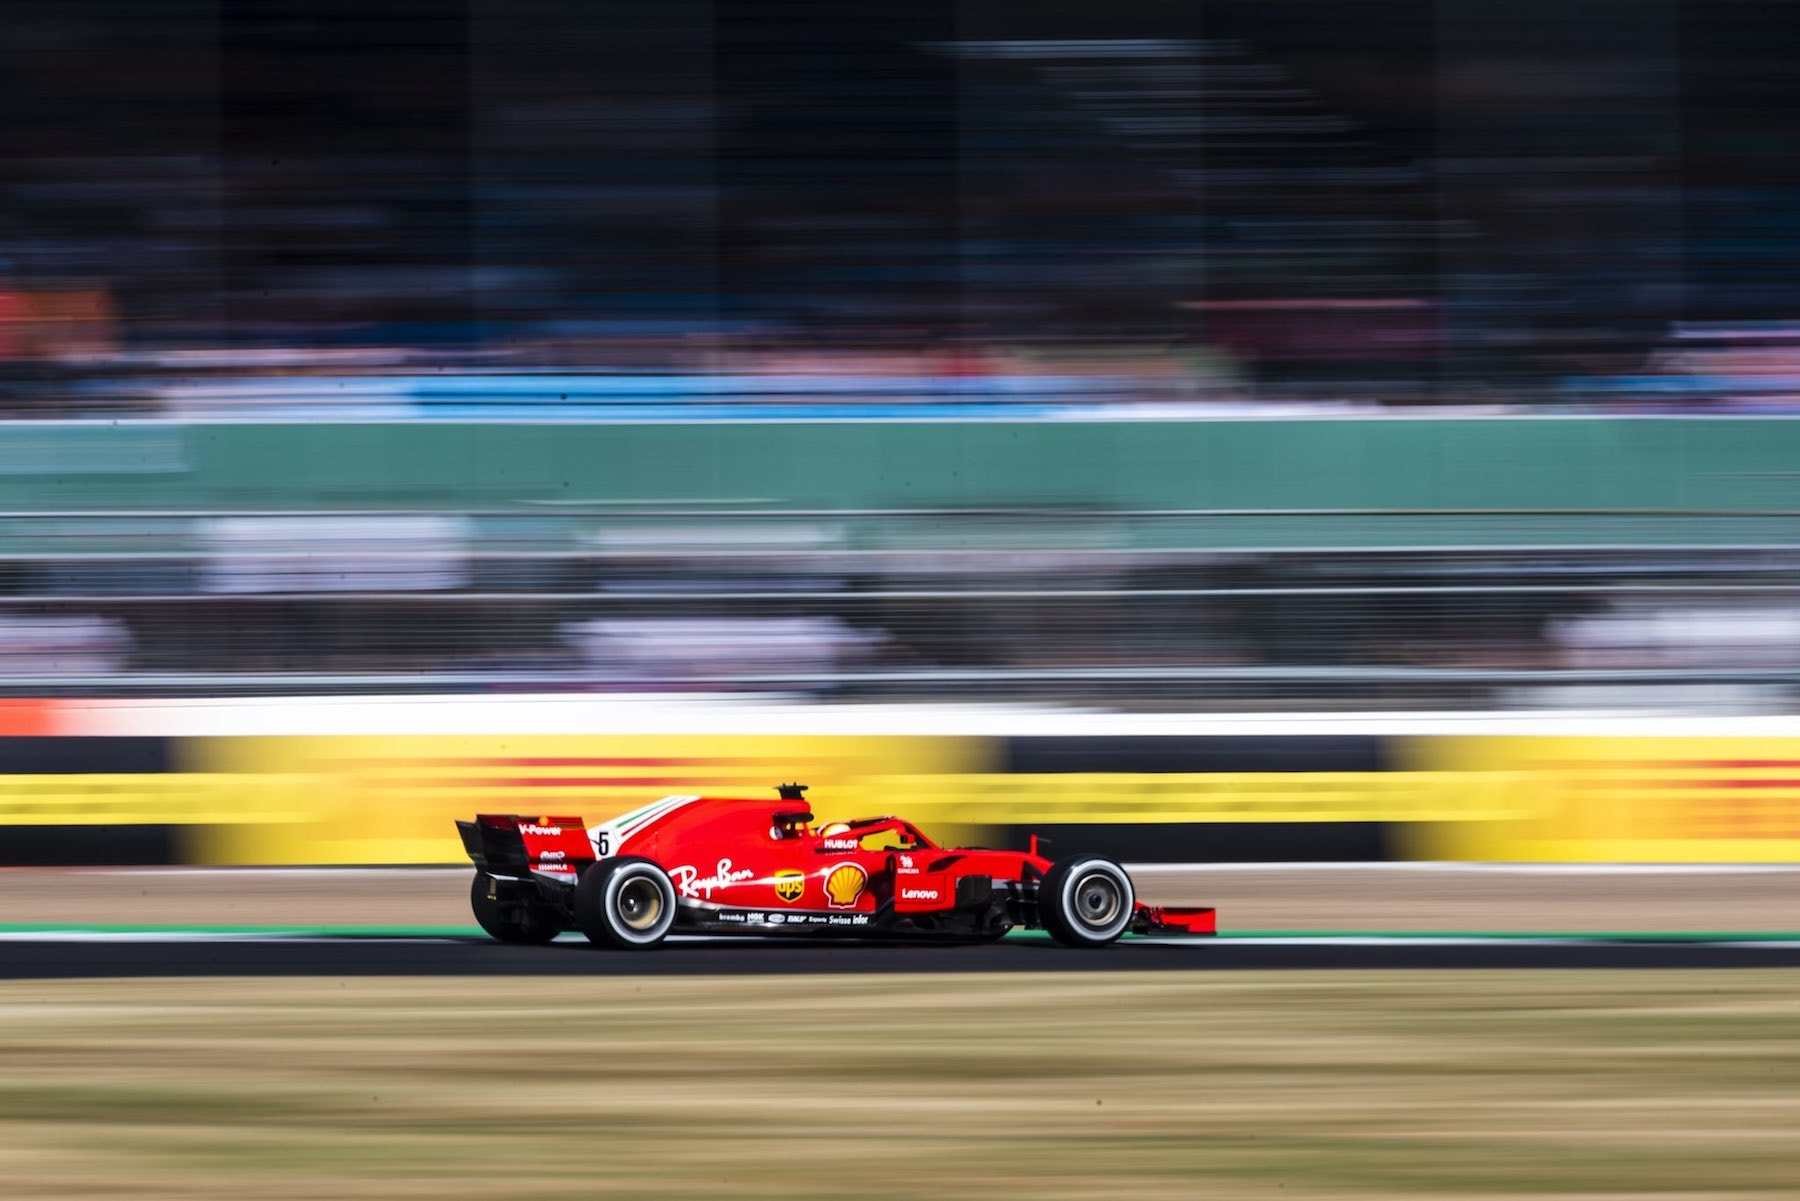 2018 Sebastian Vettel | Ferrari SF71H | 2018 British GP FP2 1 copy.jpg